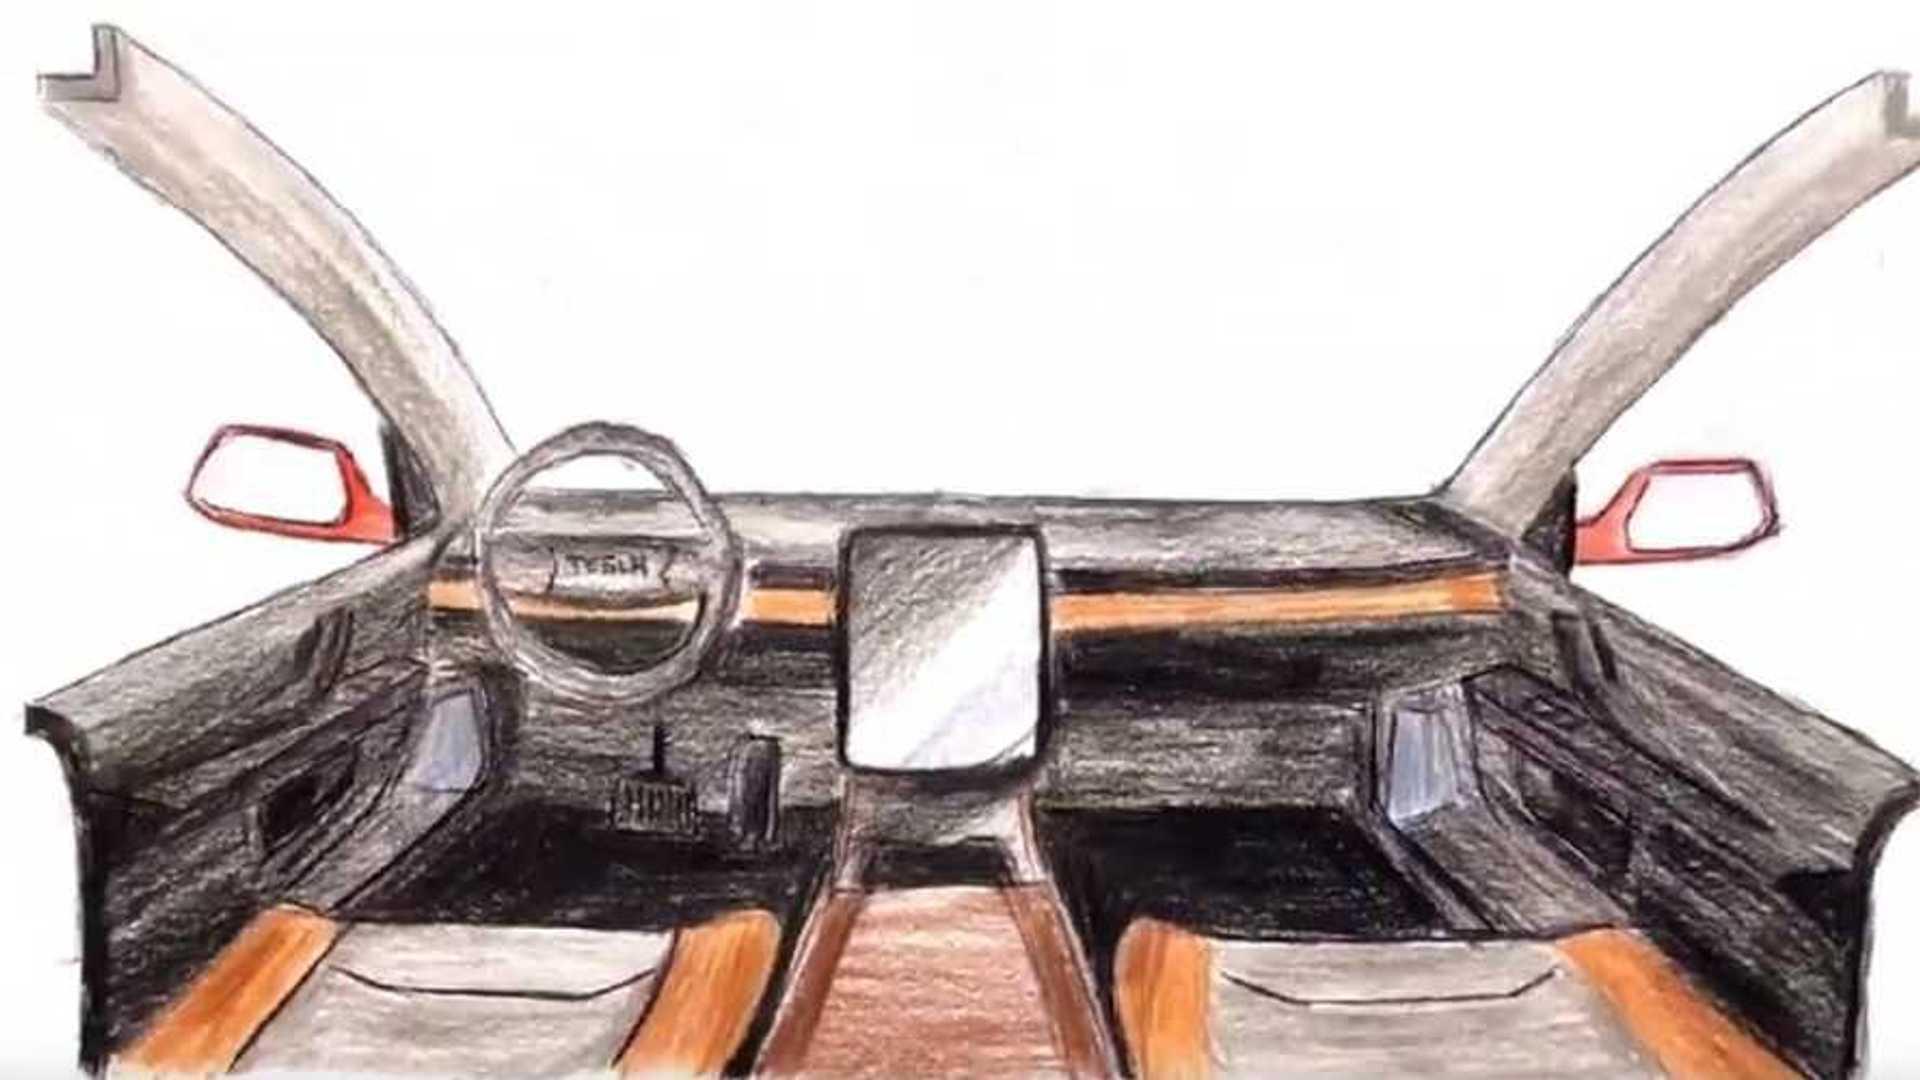 Tesla Pickup Truck Interior With Ram 1500 Styling Looks Striking